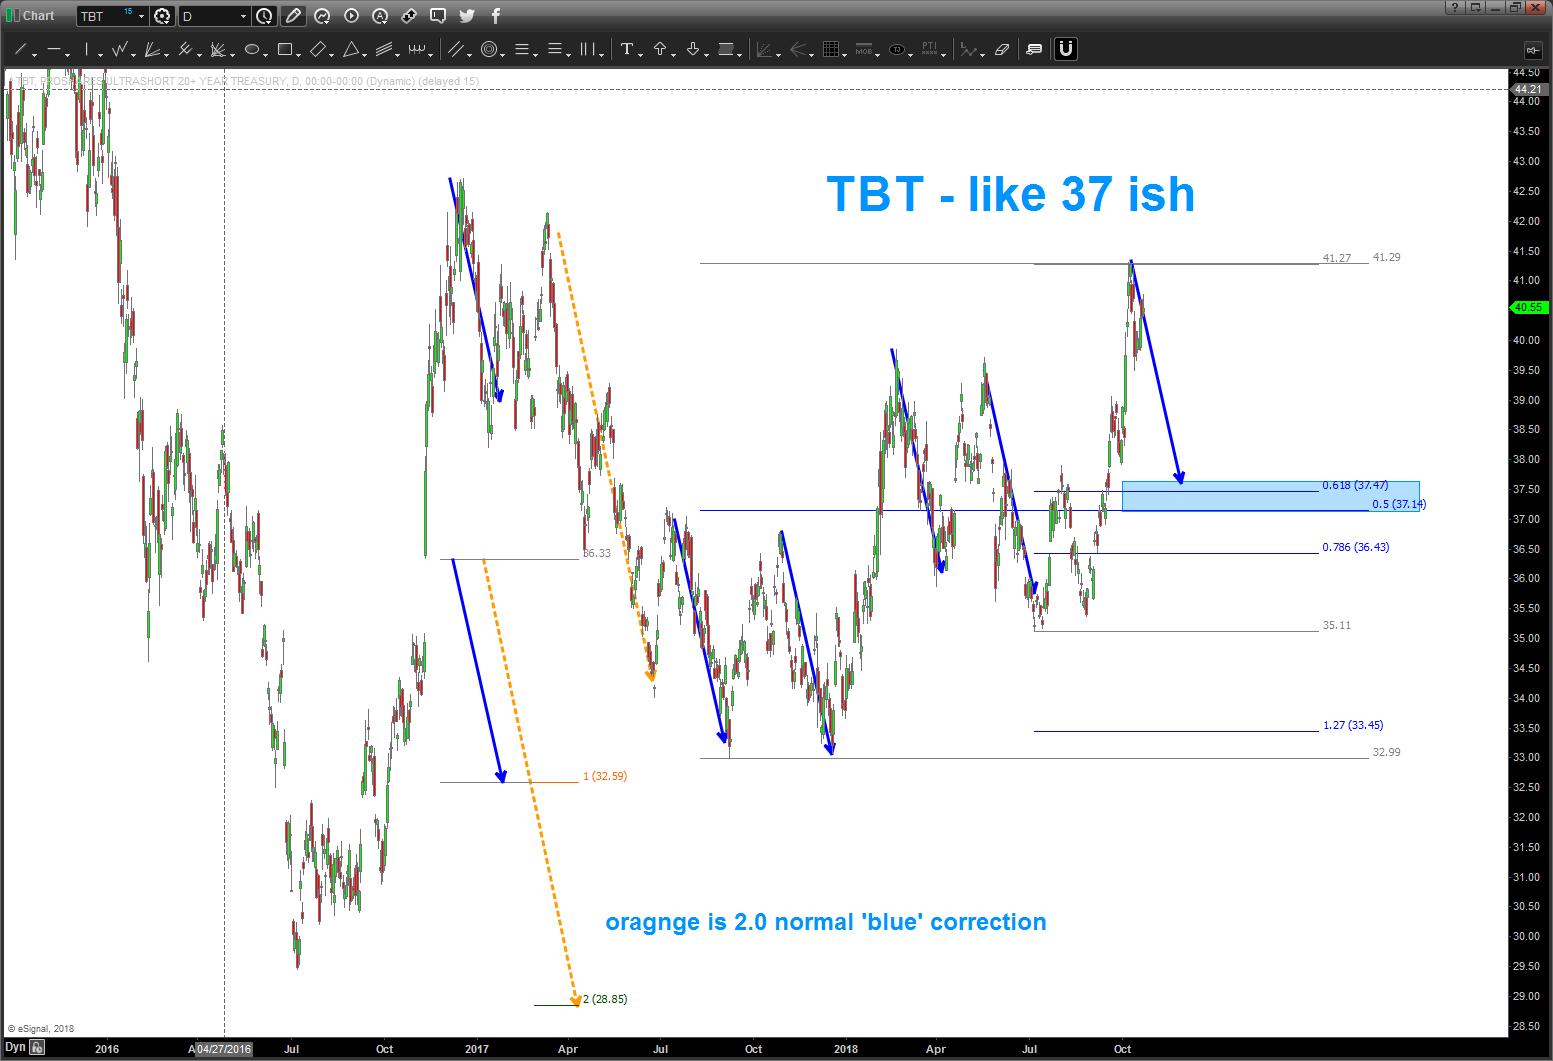 tbt short treasury bonds etf trading price analysis october support target